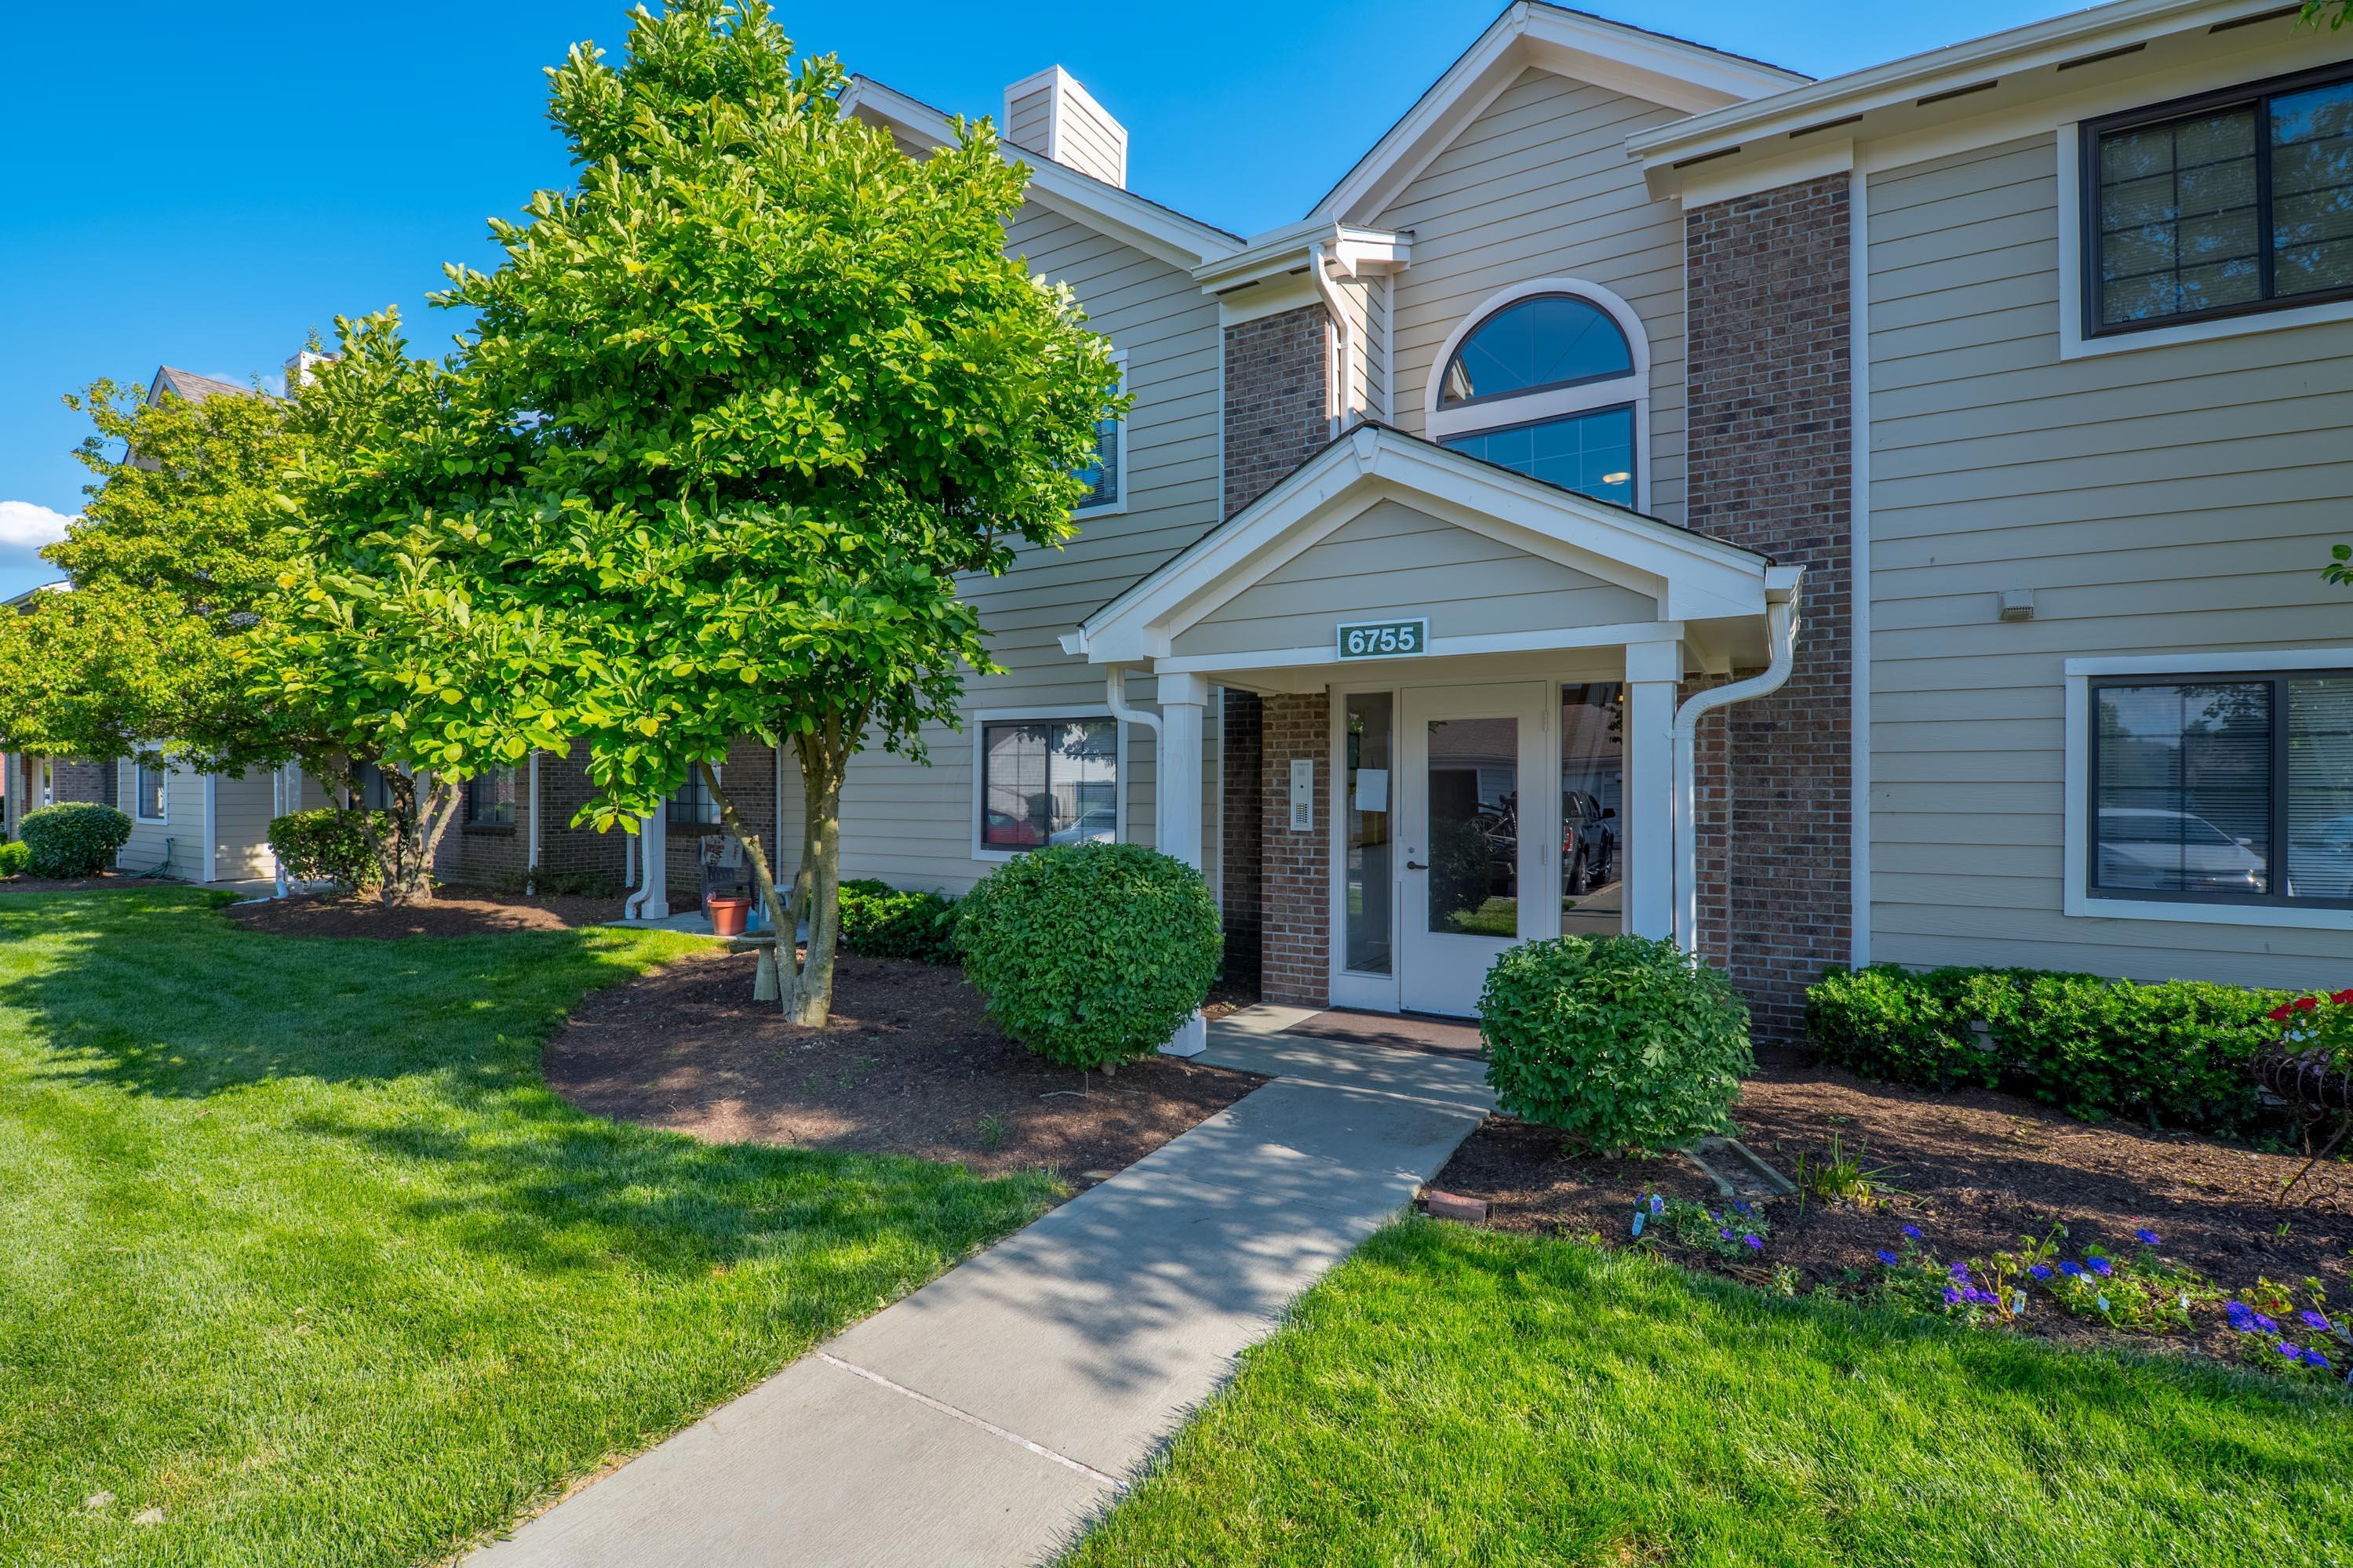 6755 Meadow Creek Drive, Columbus, Ohio 43235, 2 Bedrooms Bedrooms, ,2 BathroomsBathrooms,Residential,For Sale,Meadow Creek,220019121